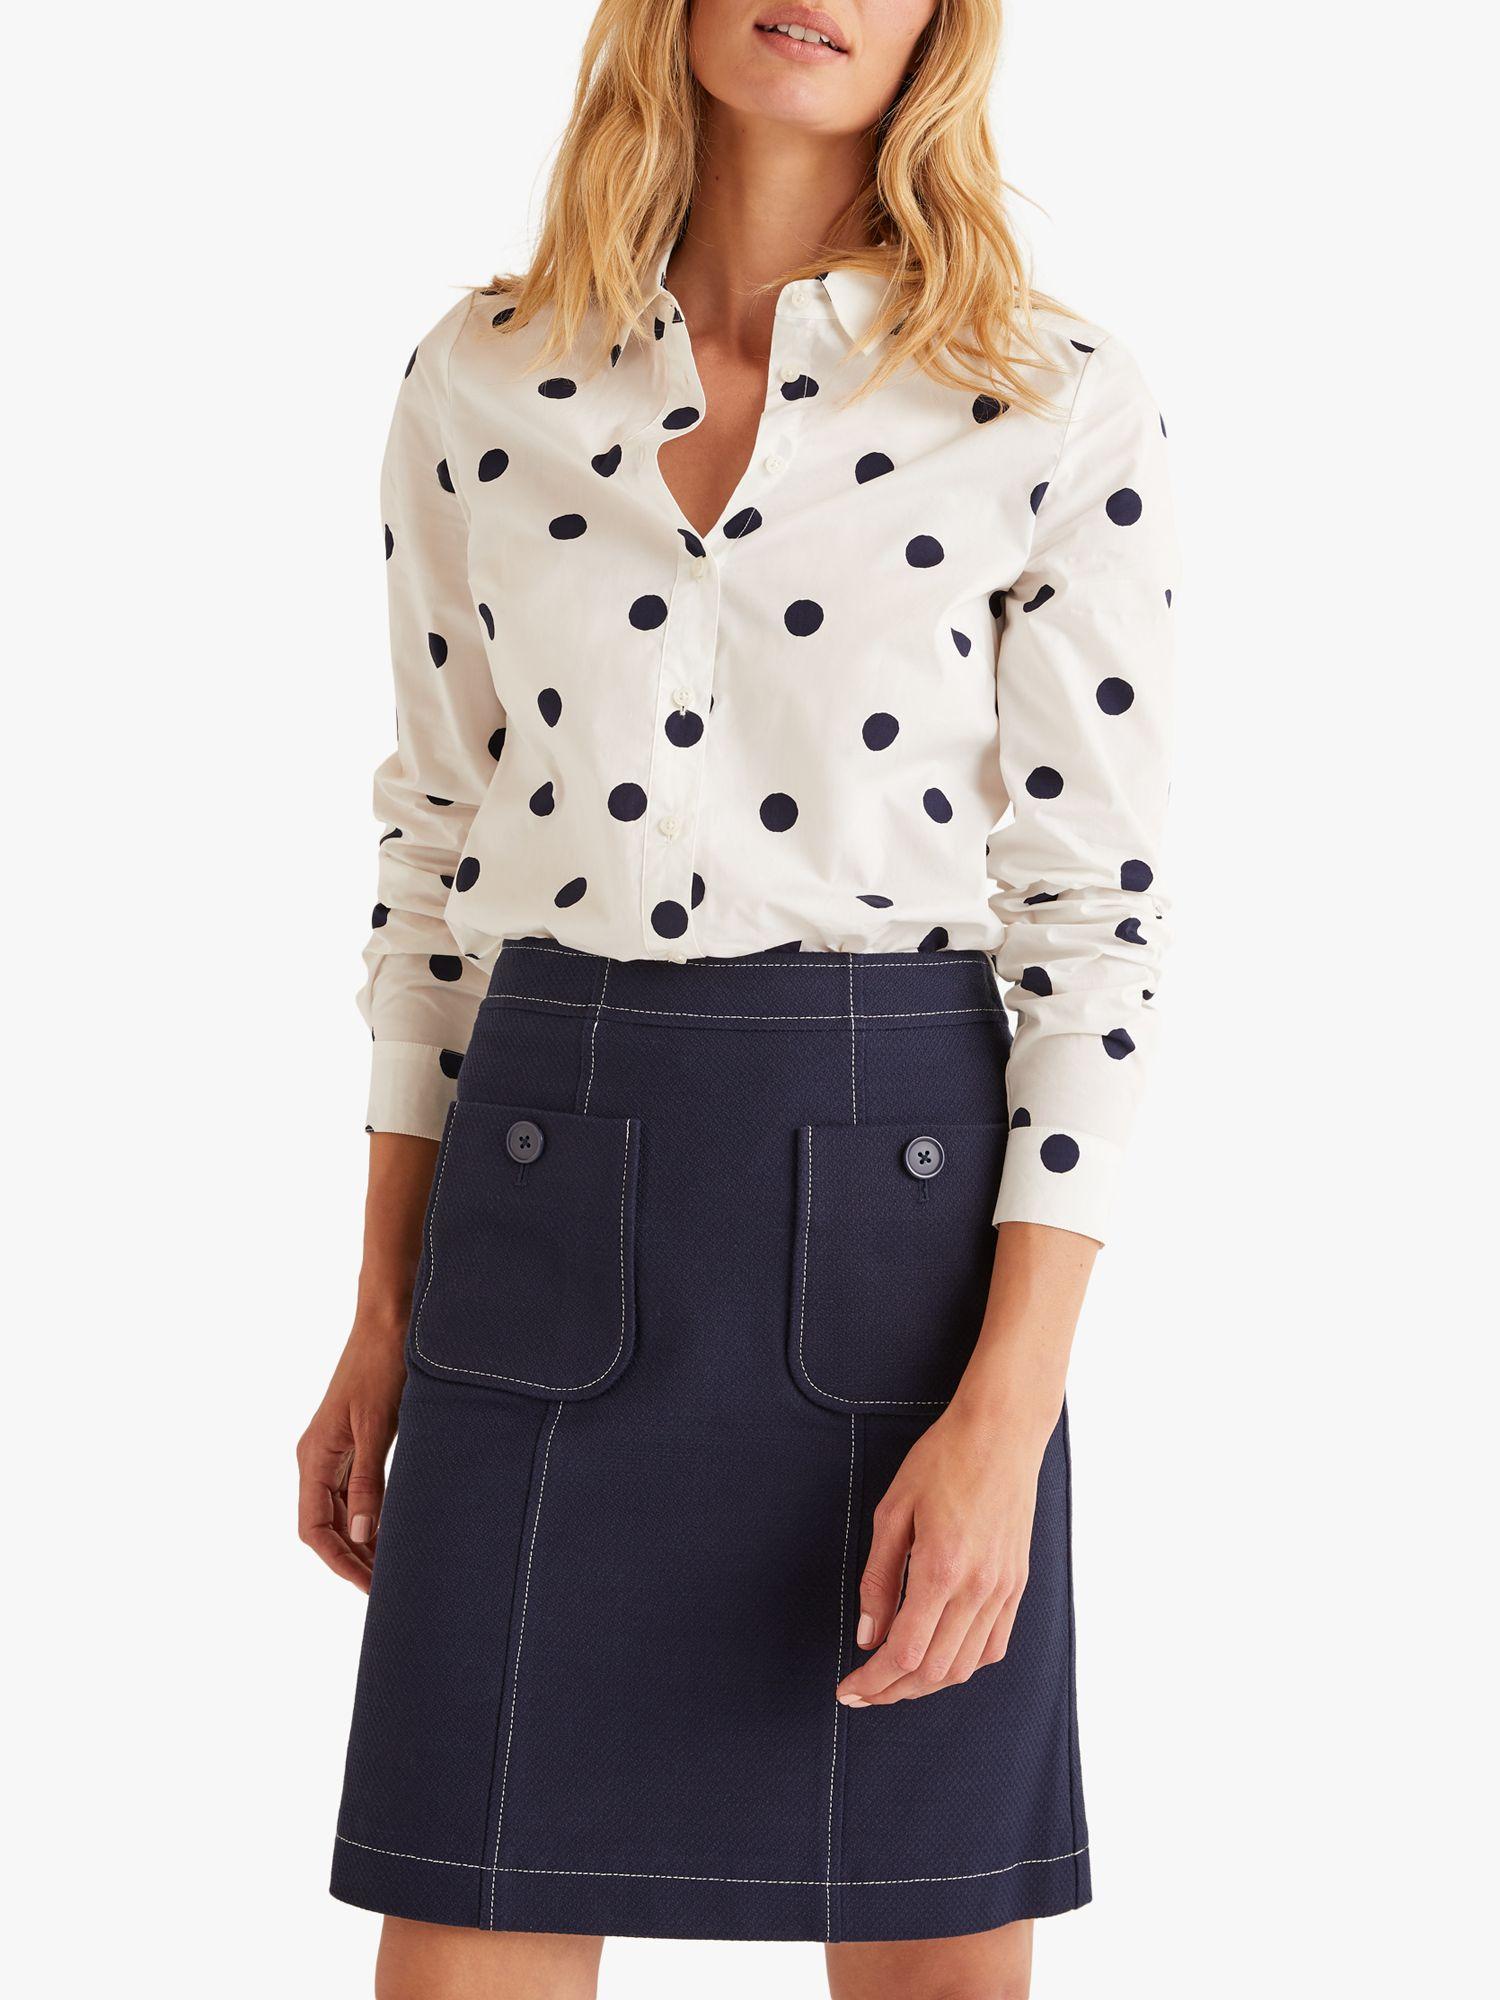 Boden Boden Modern Polka Dot Shirt, Ivory/Navy